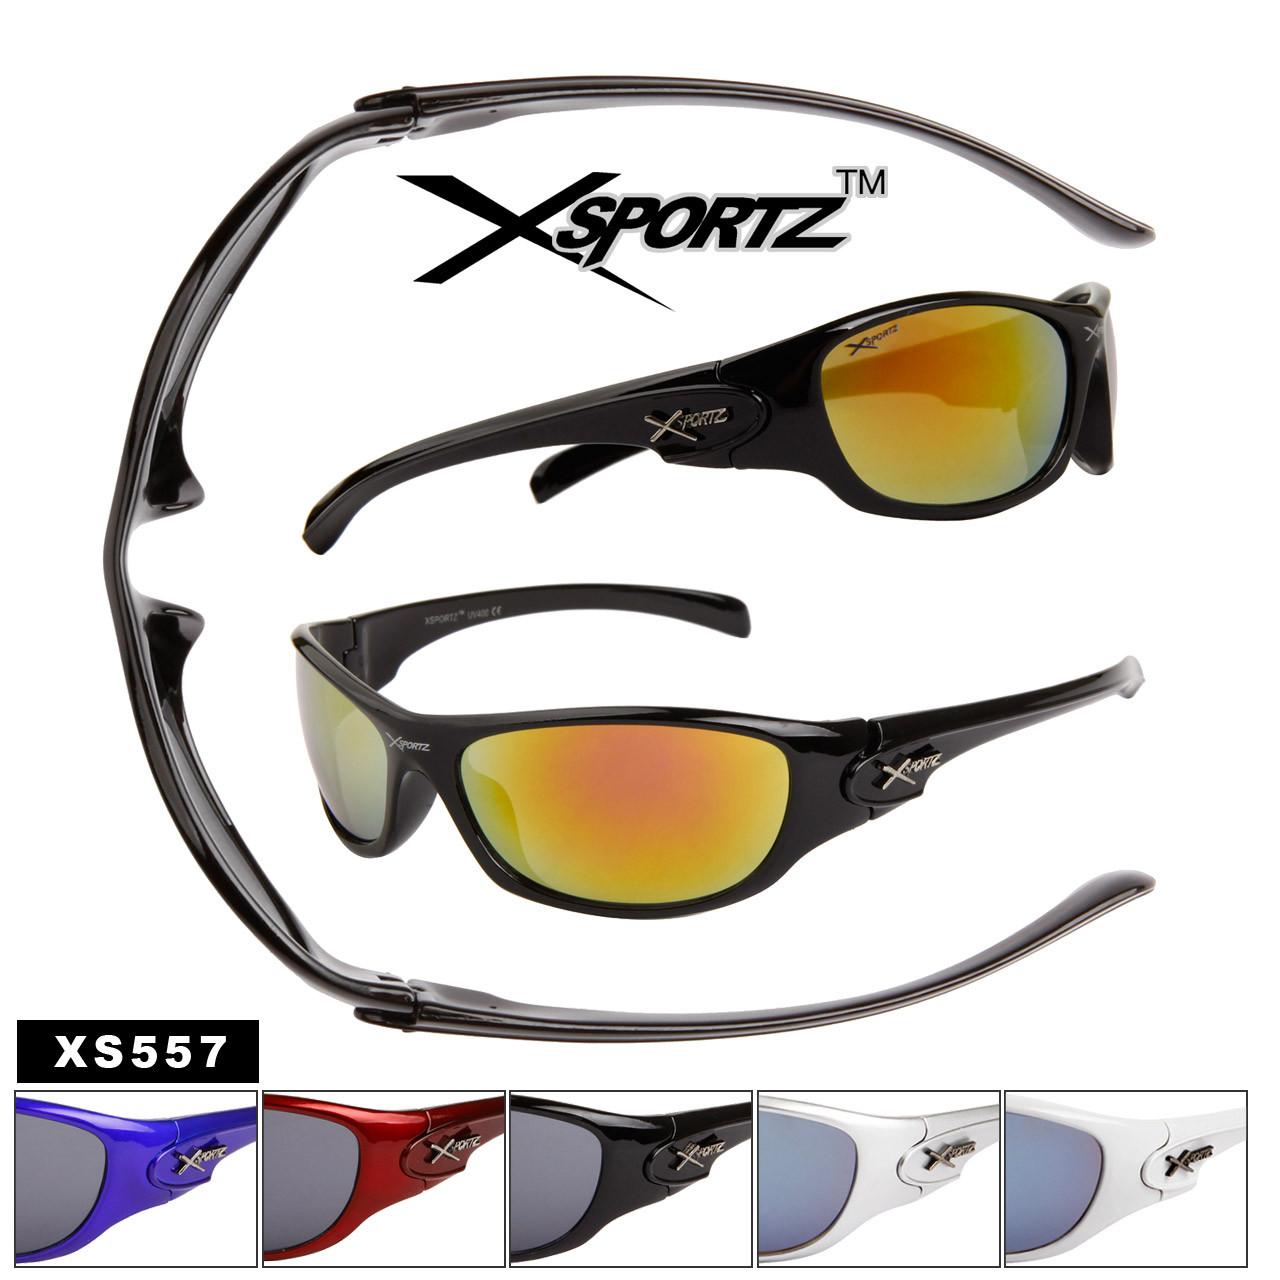 Xsportz™ Sports Wholesale Sunglasses - Style #XS557